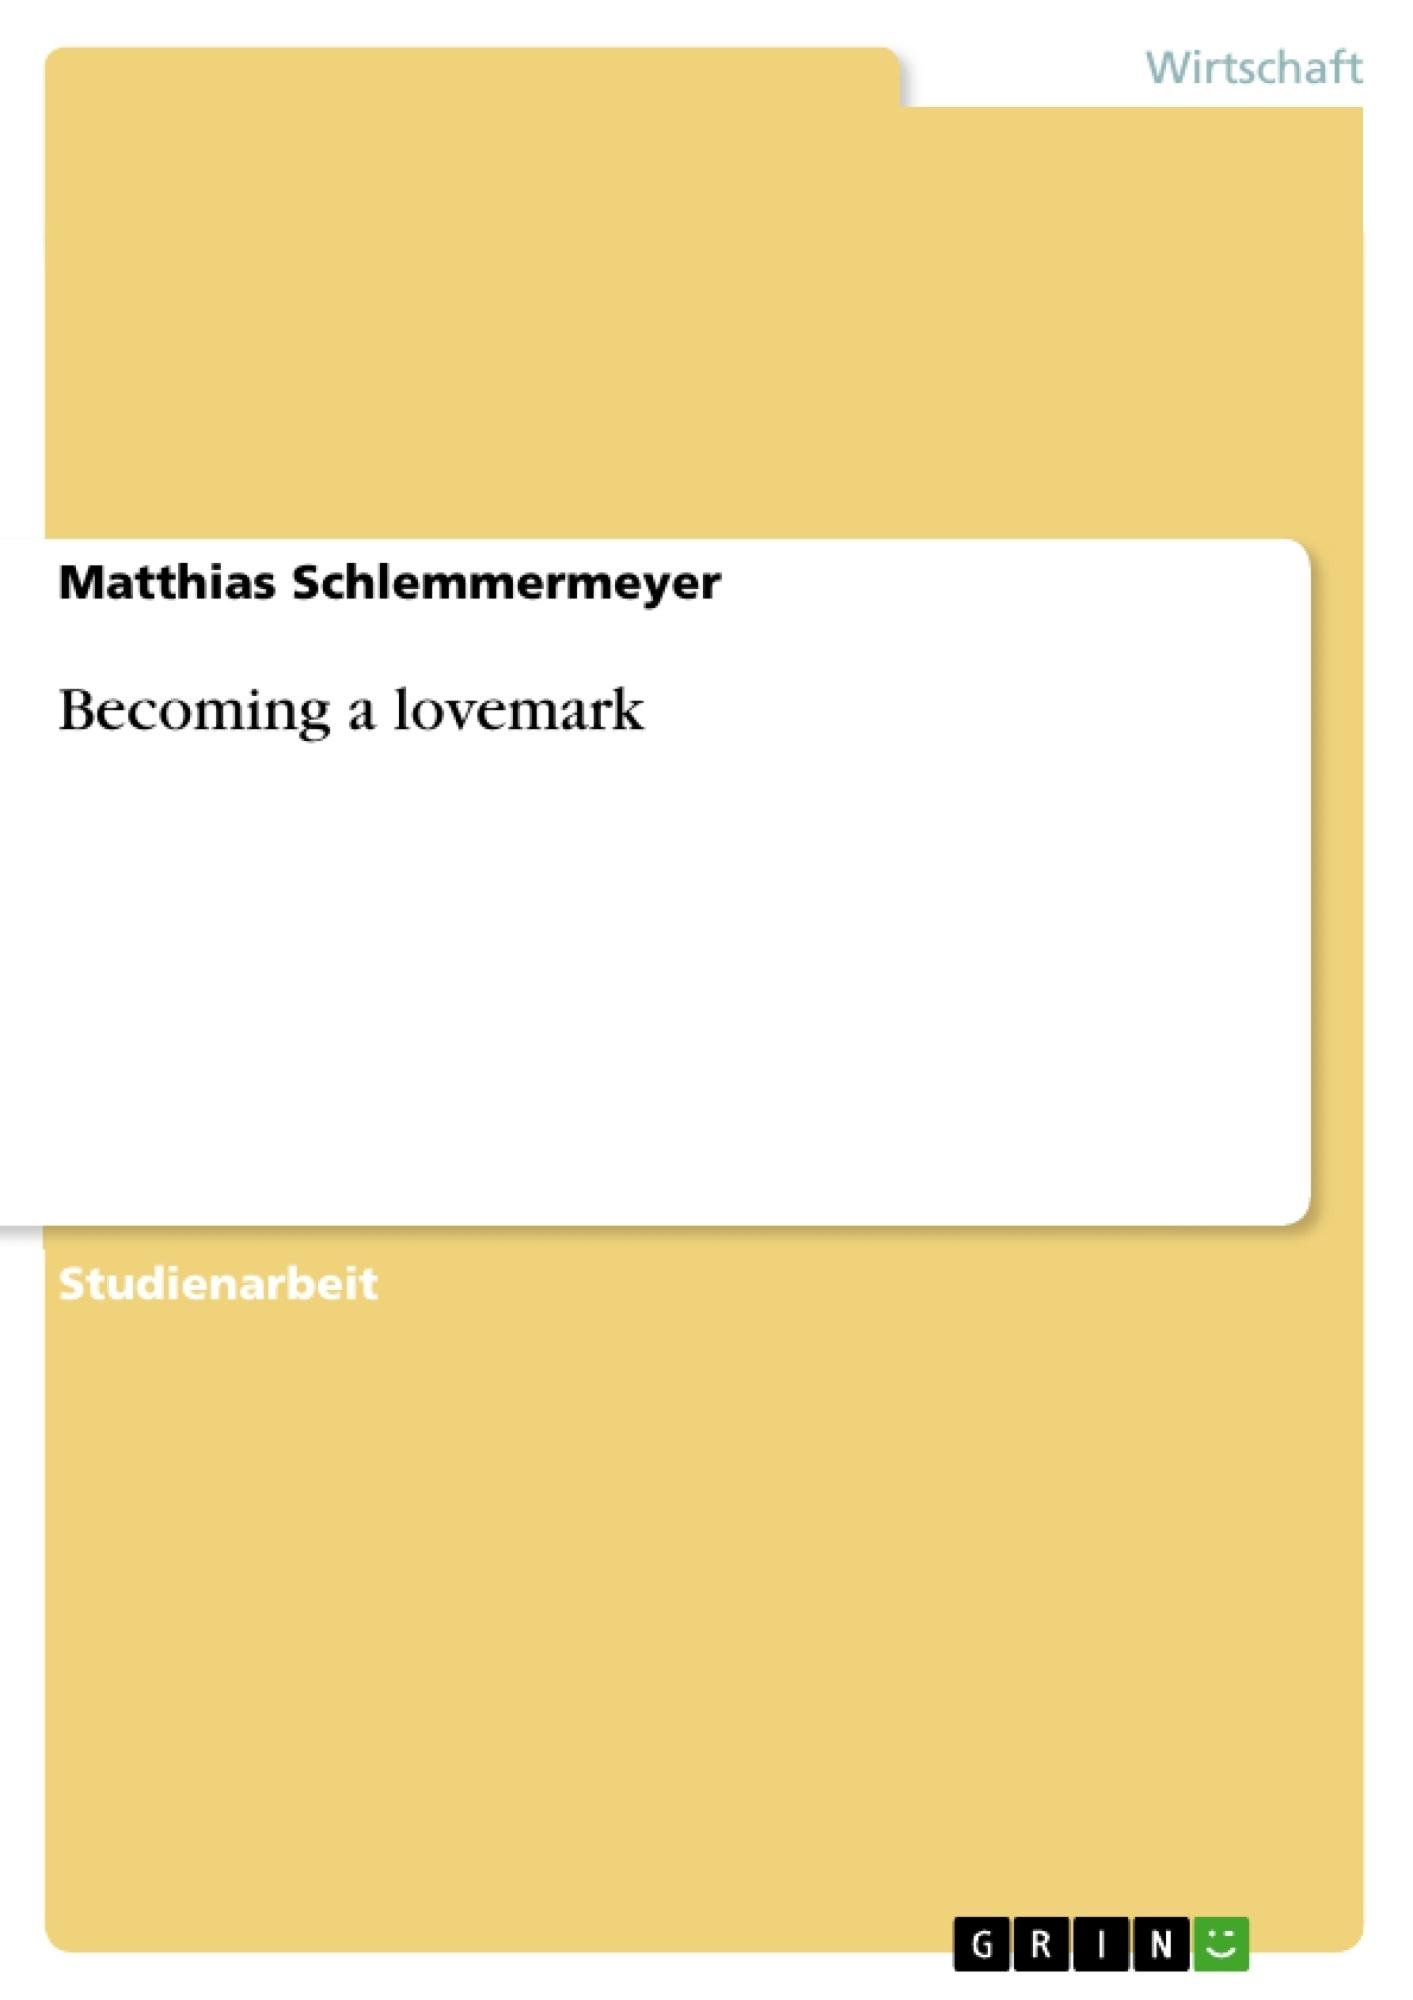 Titel: Becoming a lovemark